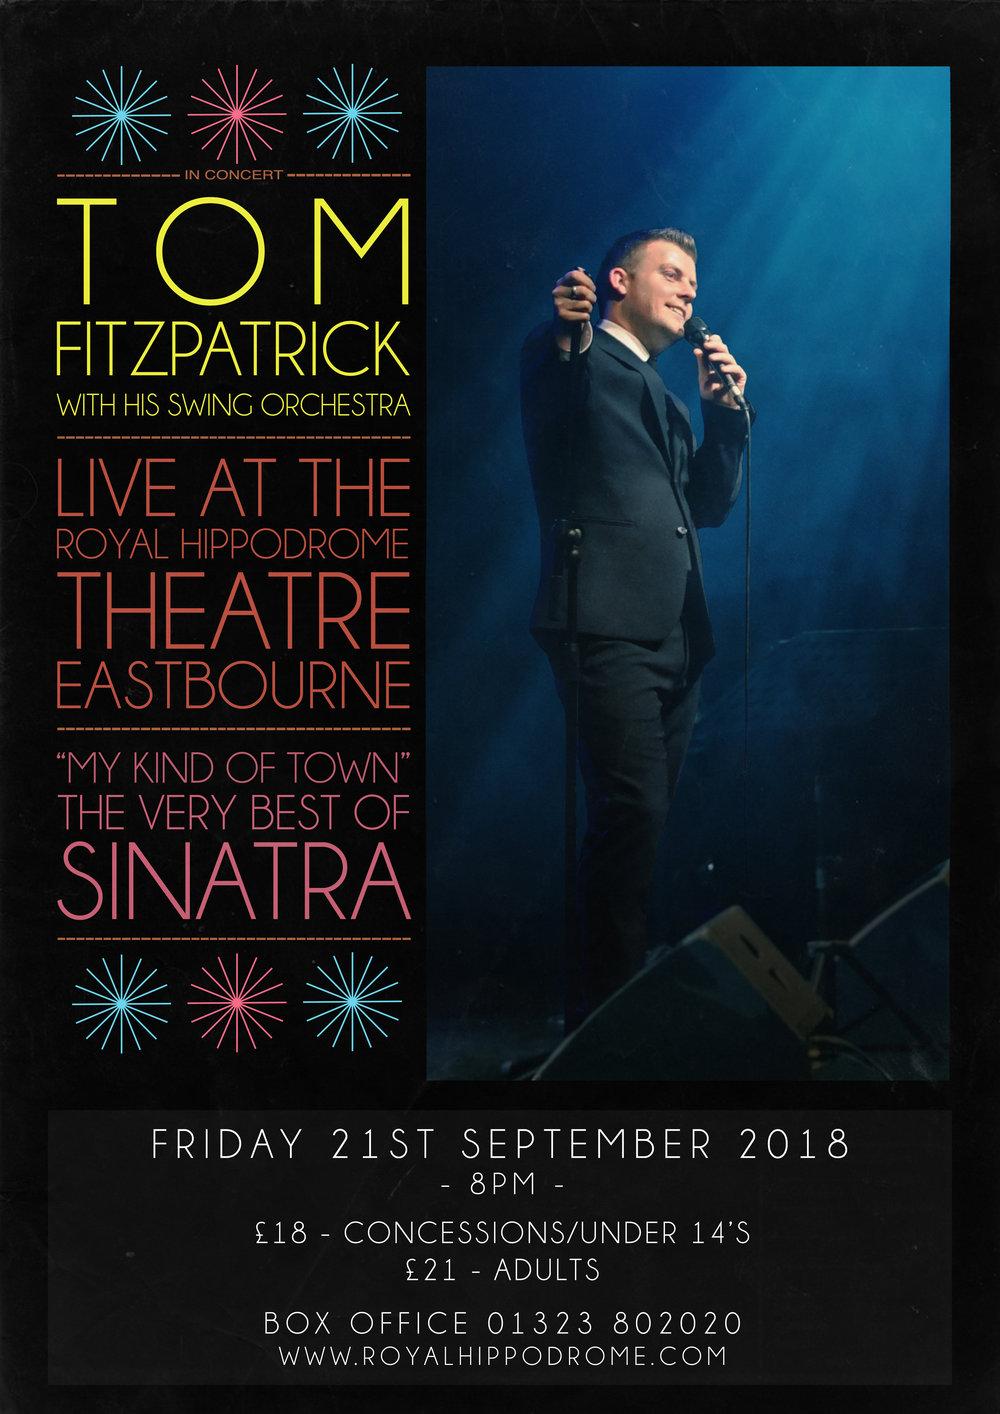 Tom Fitzpatrick Hippodrome poster 2018.jpg